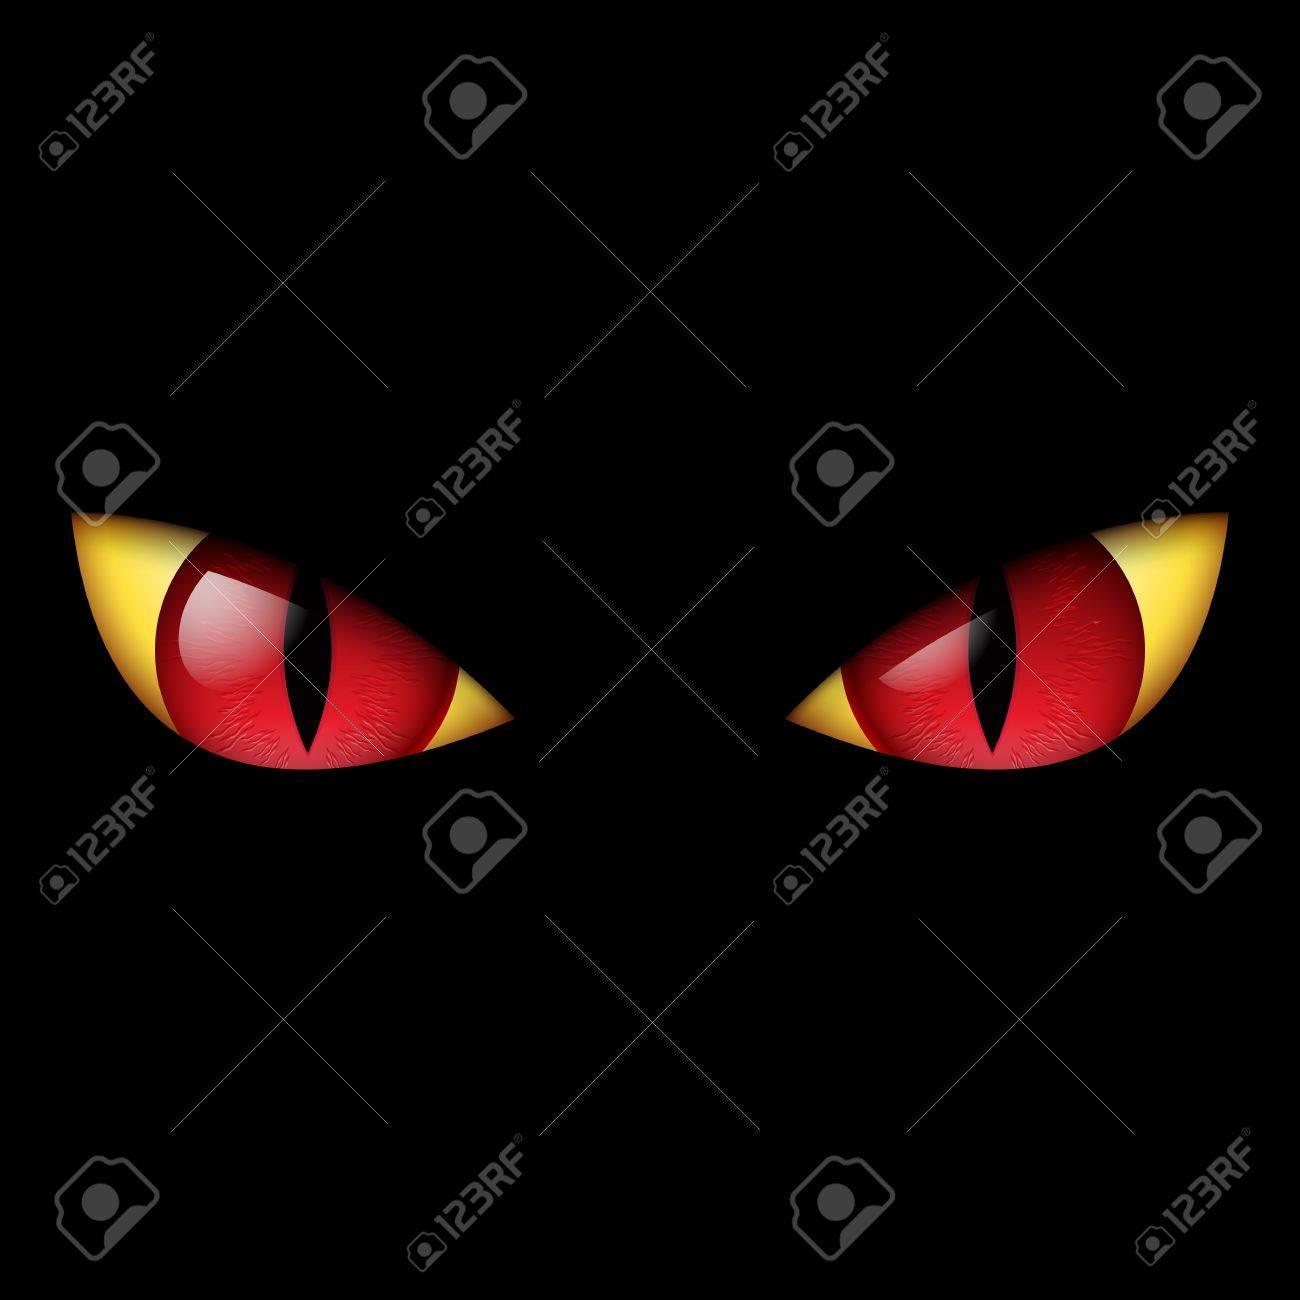 evil red eye illustration on black background royalty free